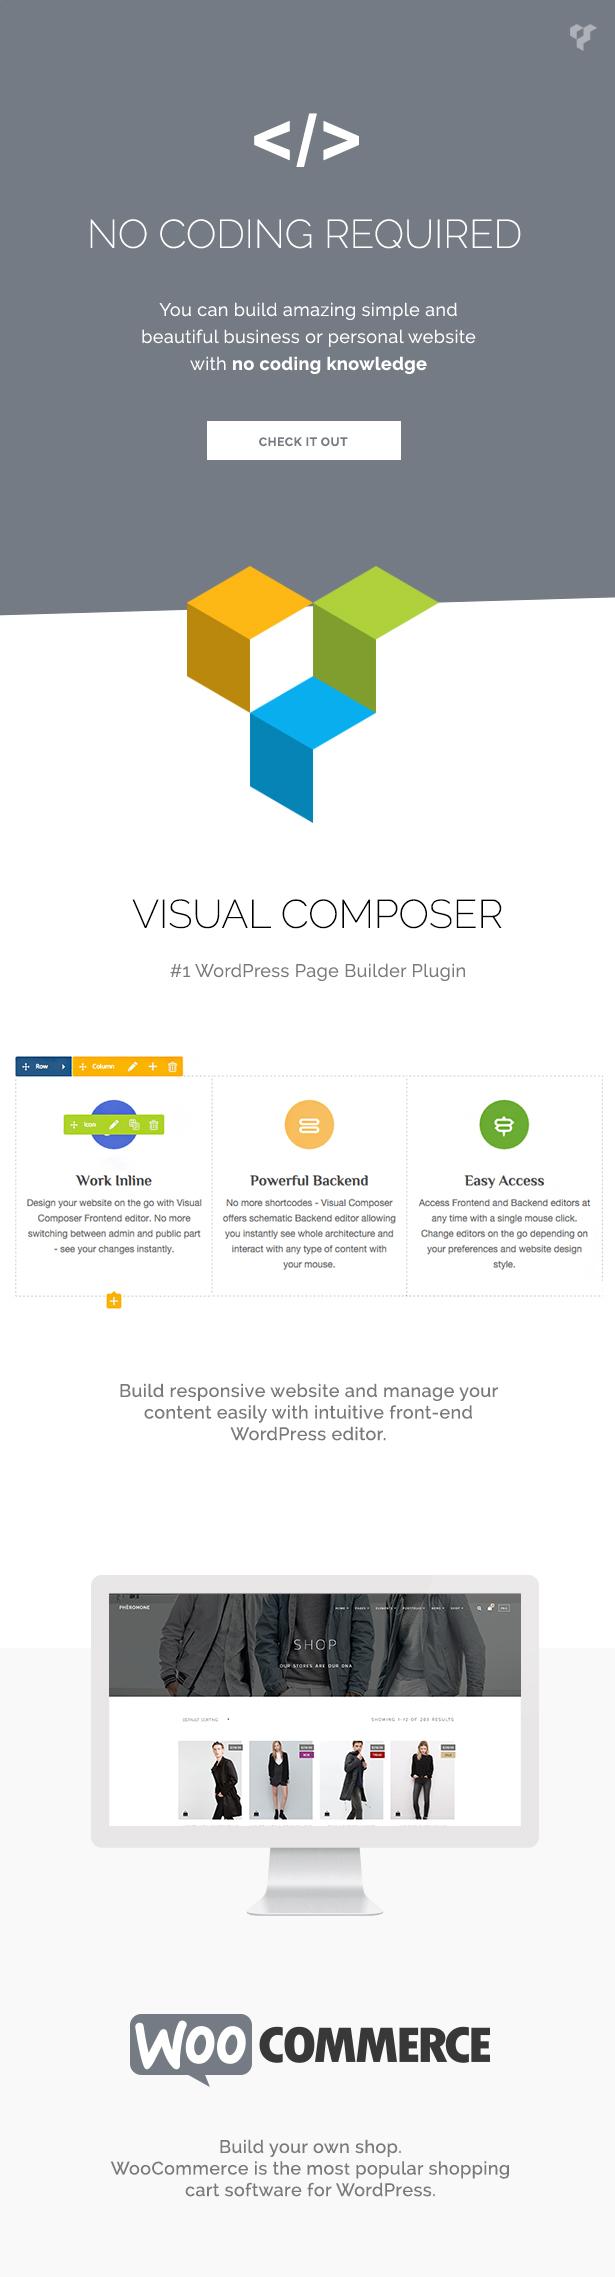 Pheromone - Creative Multi-Concept WordPress Theme - 4